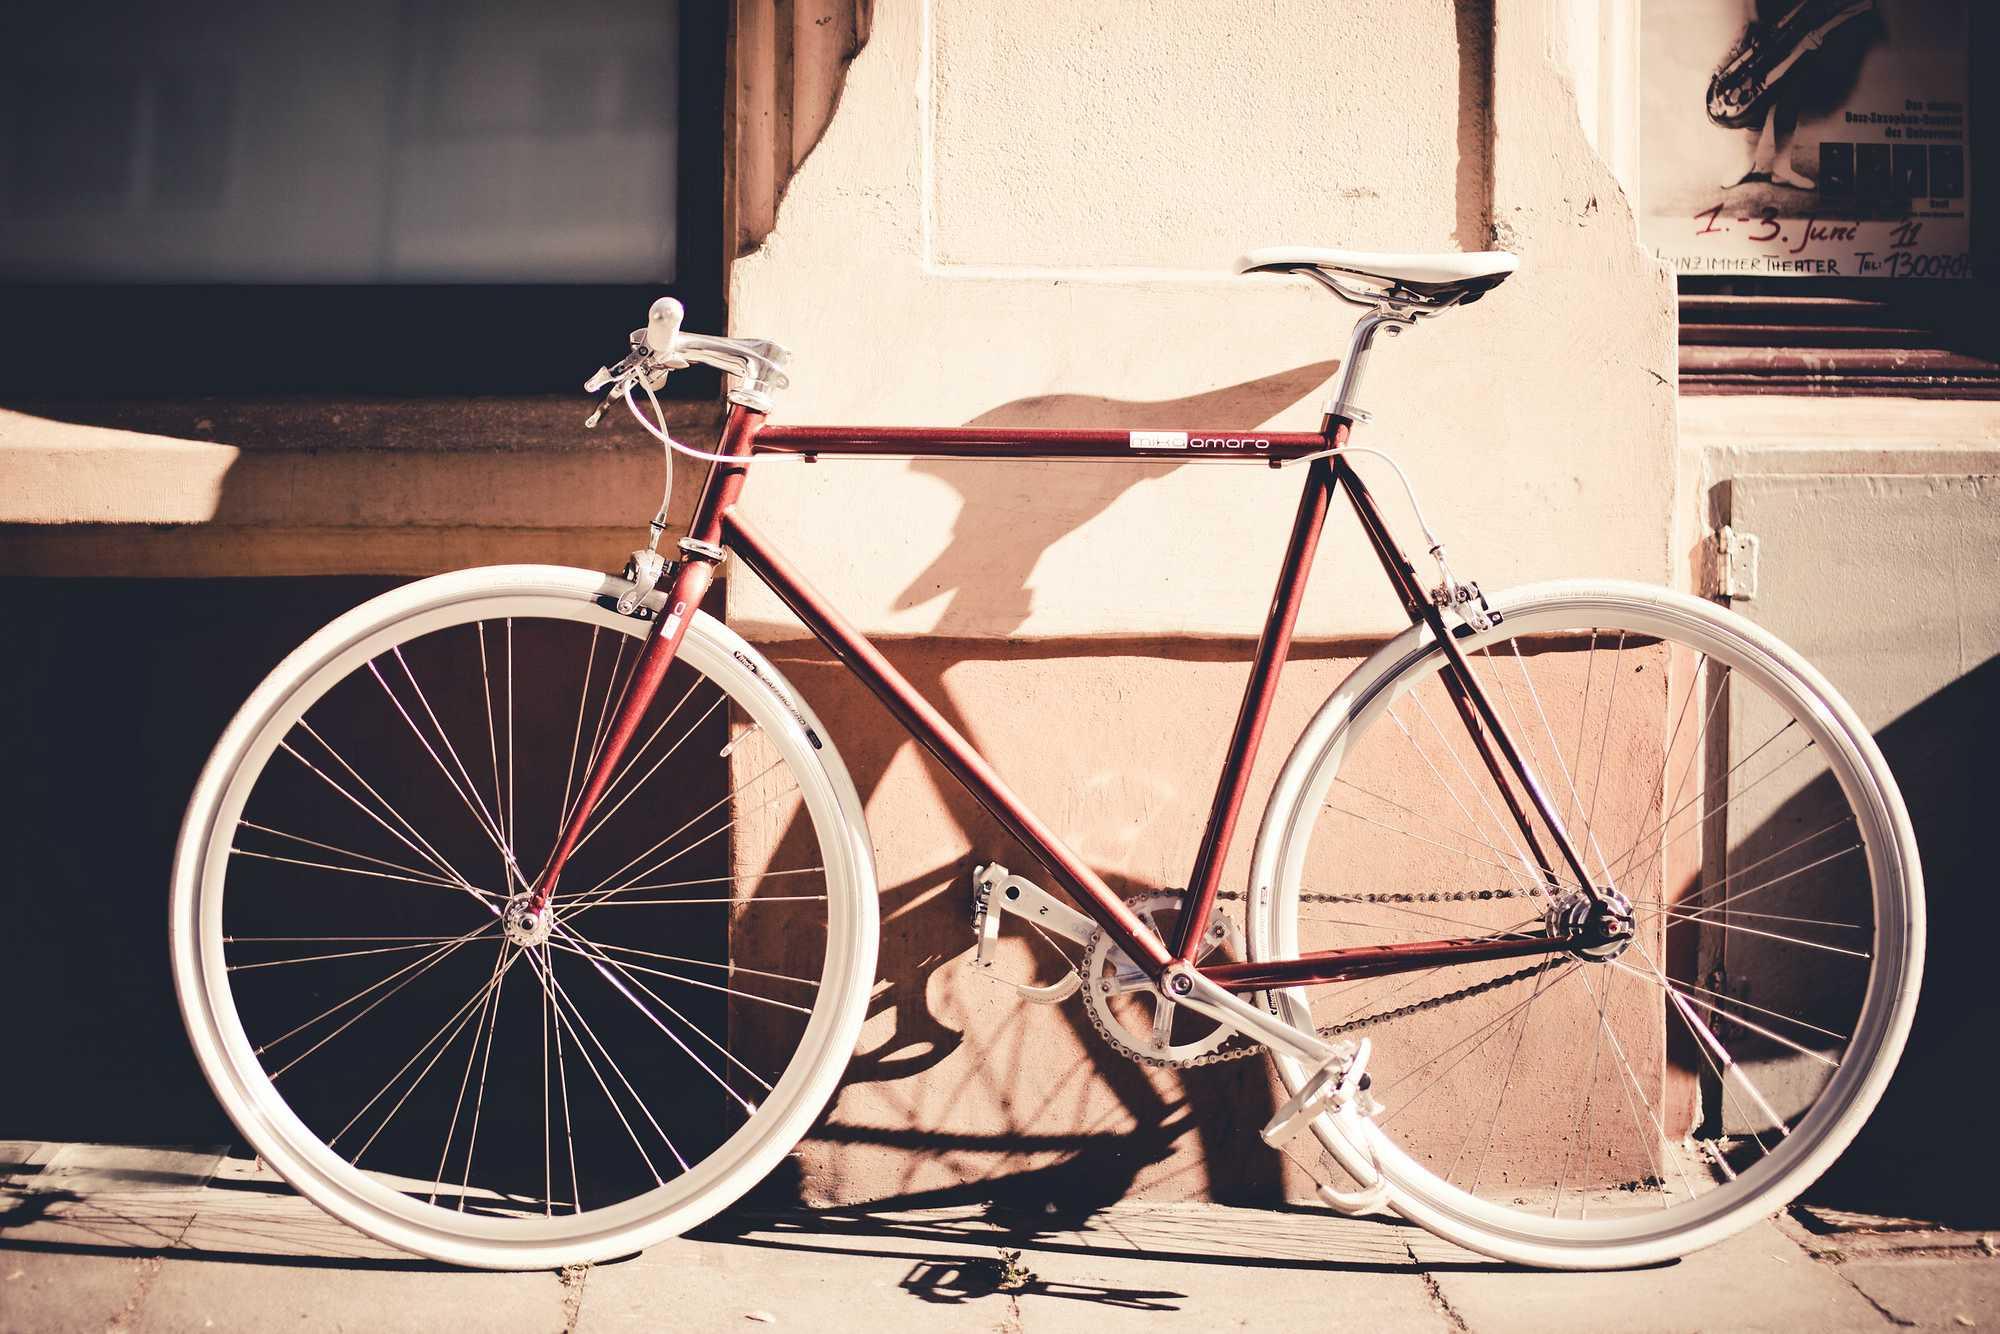 Single Speed Bike fuel brow, urban